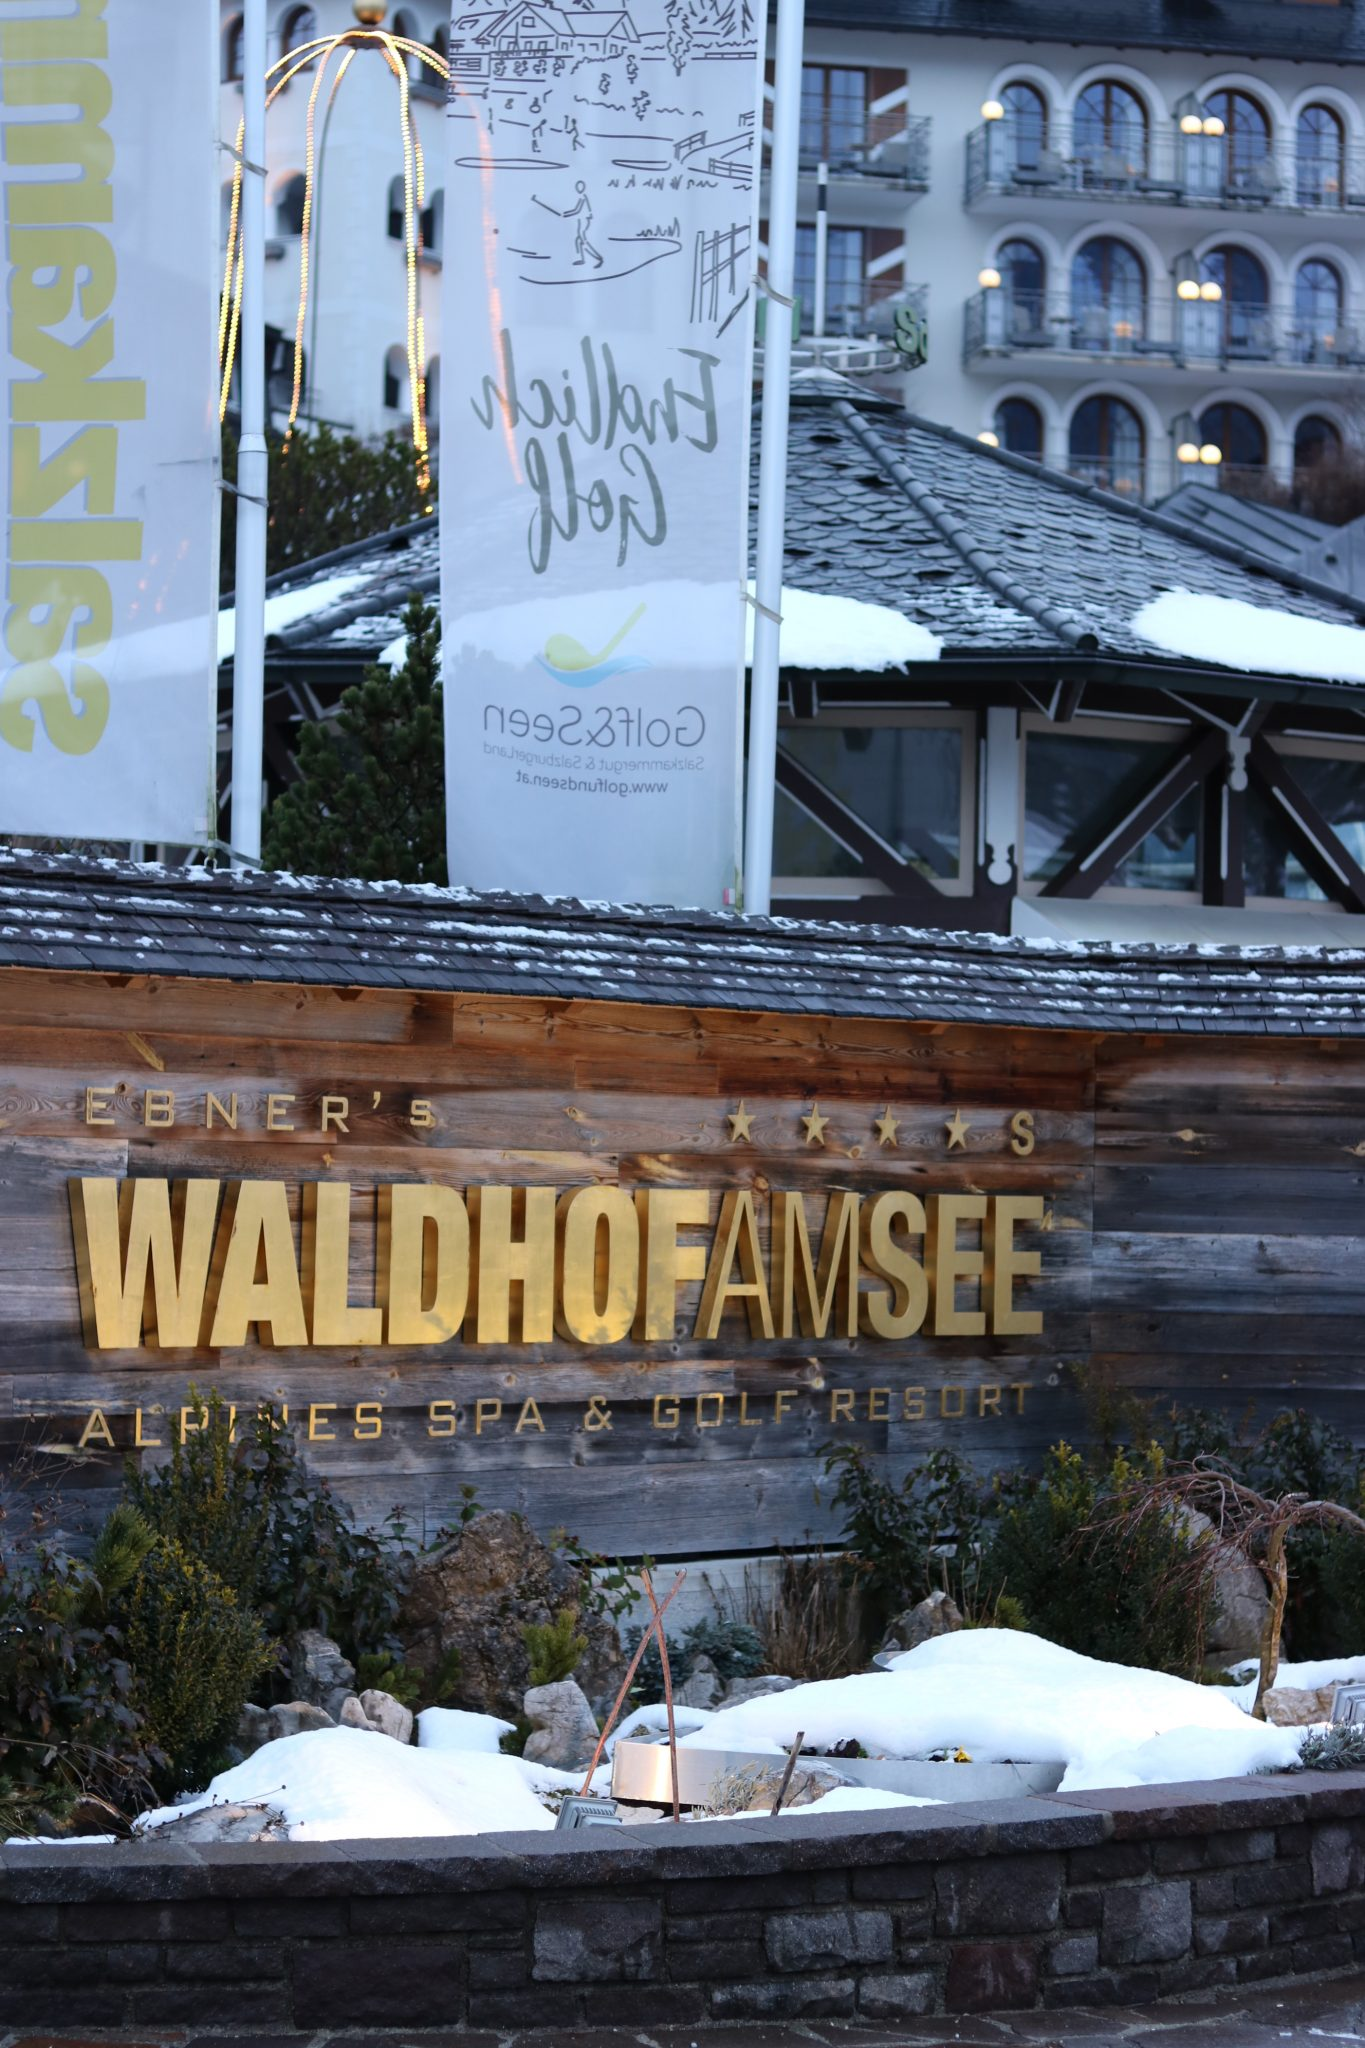 ebners-waldhof-am-see-bewertung-travel-bloggerin